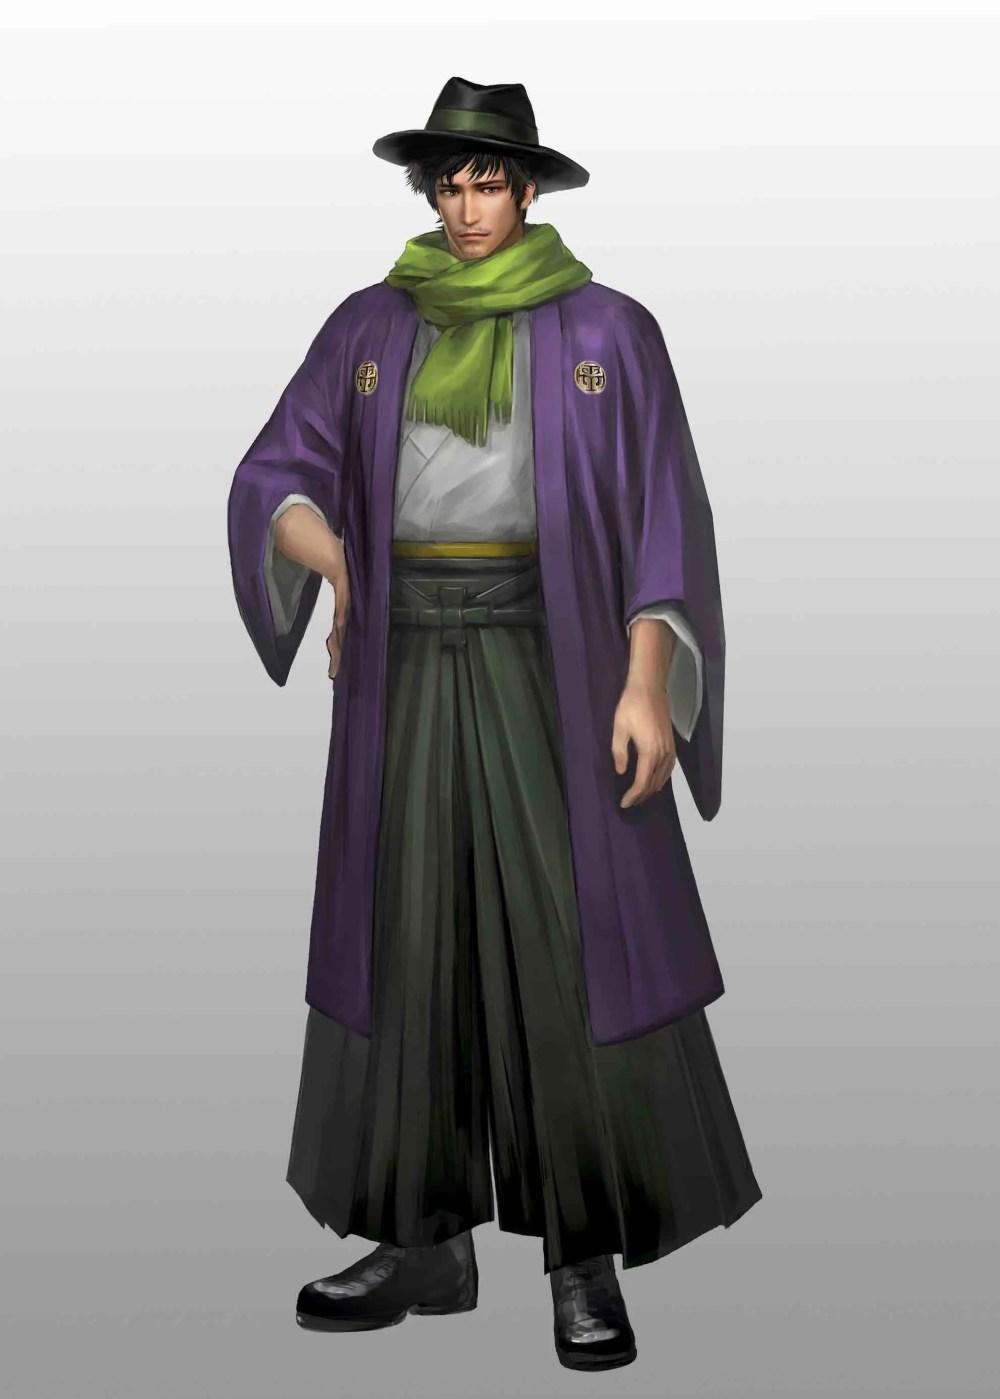 Warriors Orochi 4 Xu Shu Alternate Costume